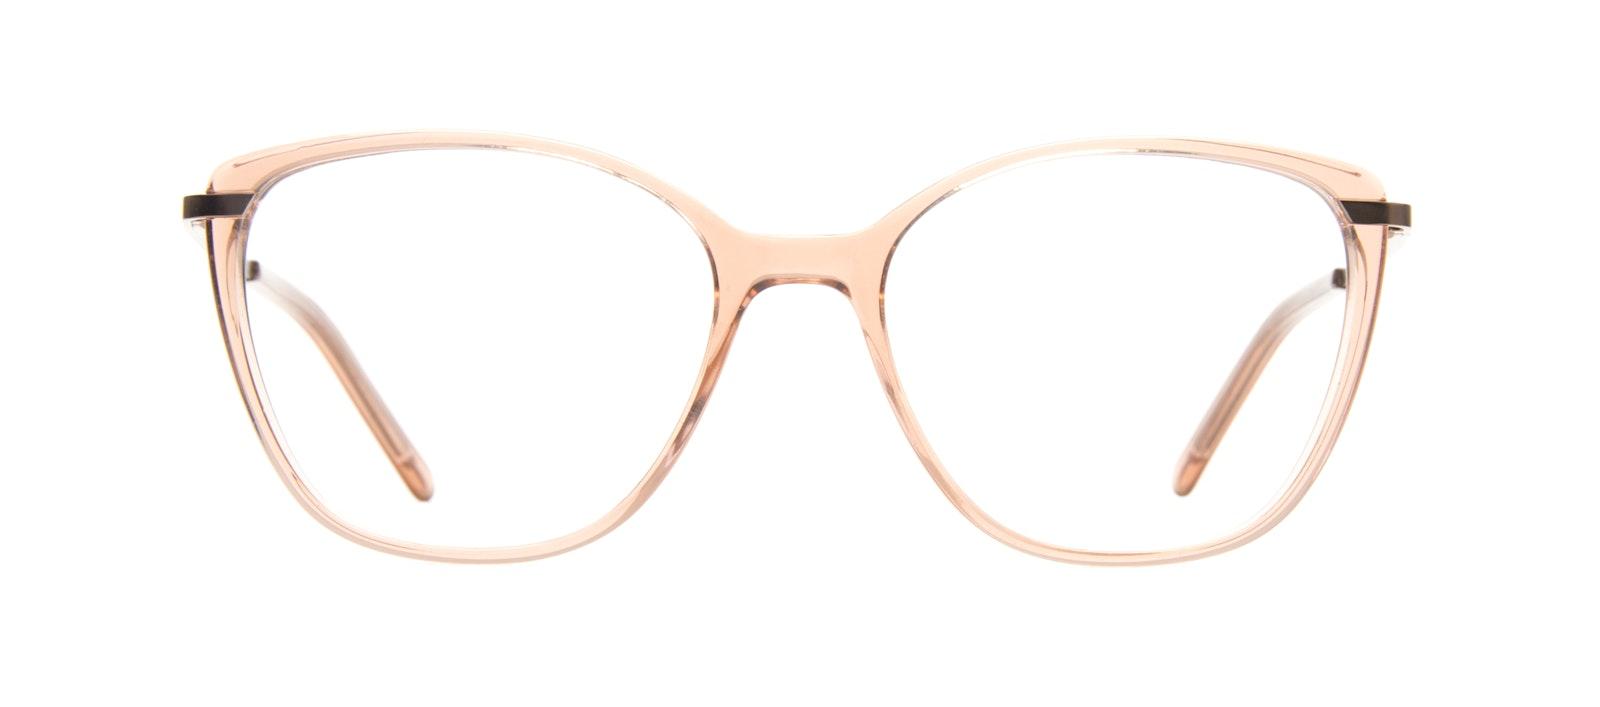 Affordable Fashion Glasses Rectangle Square Eyeglasses Women Illusion Rose Front